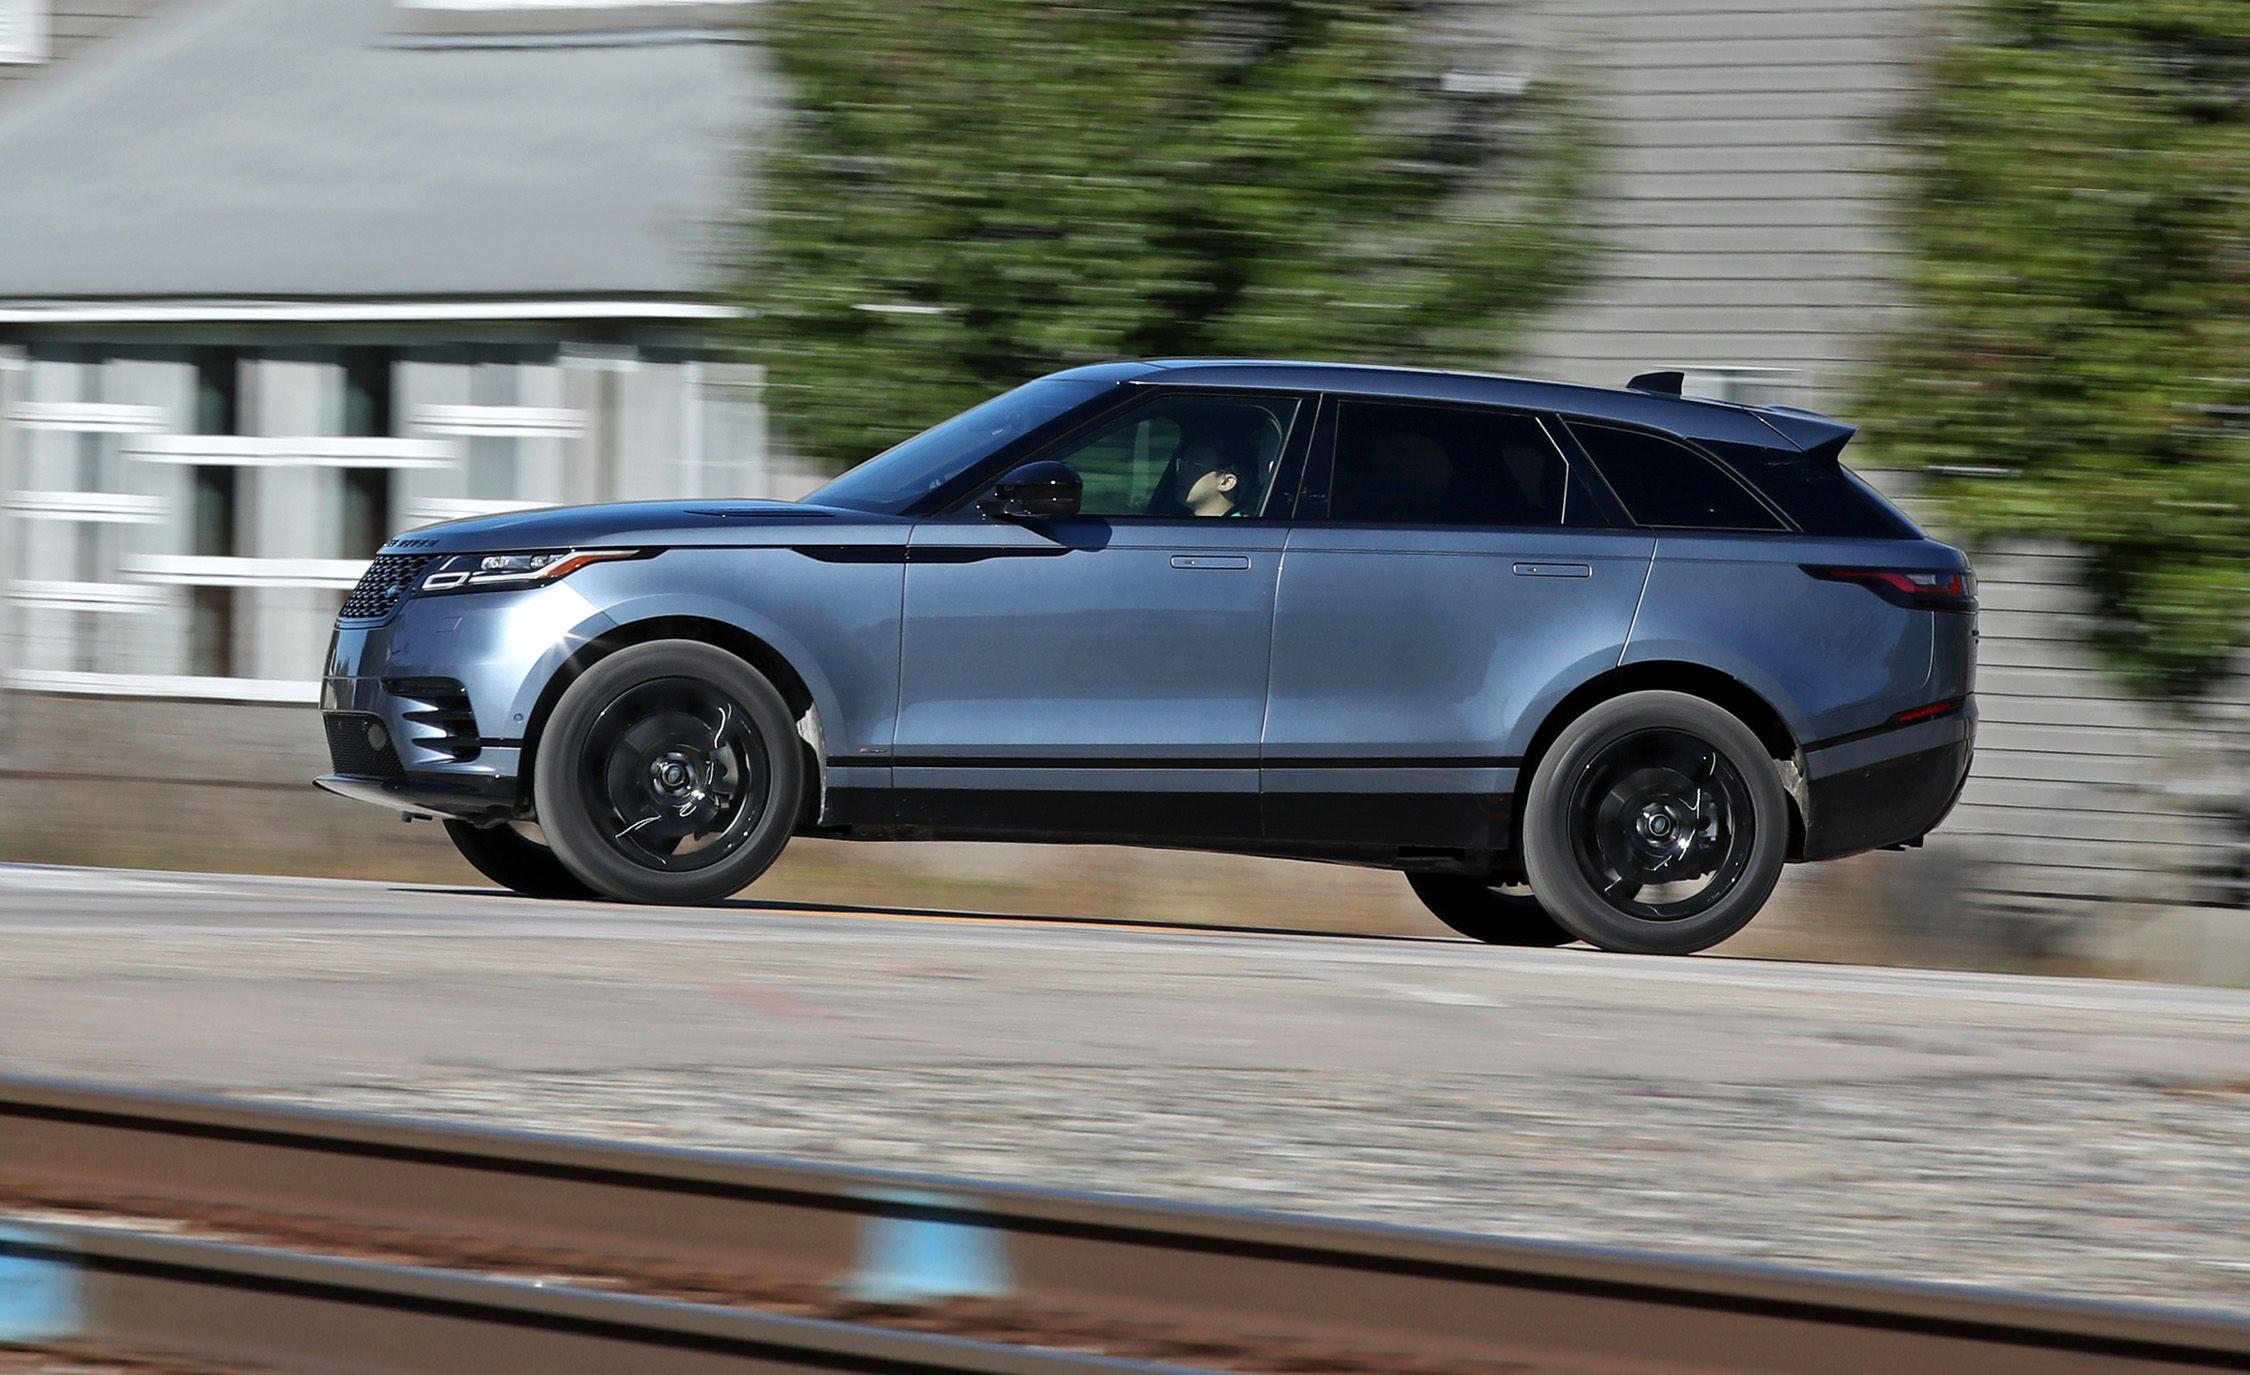 2018 Range Rover Velar | In-Depth Model Review | Car and Driver